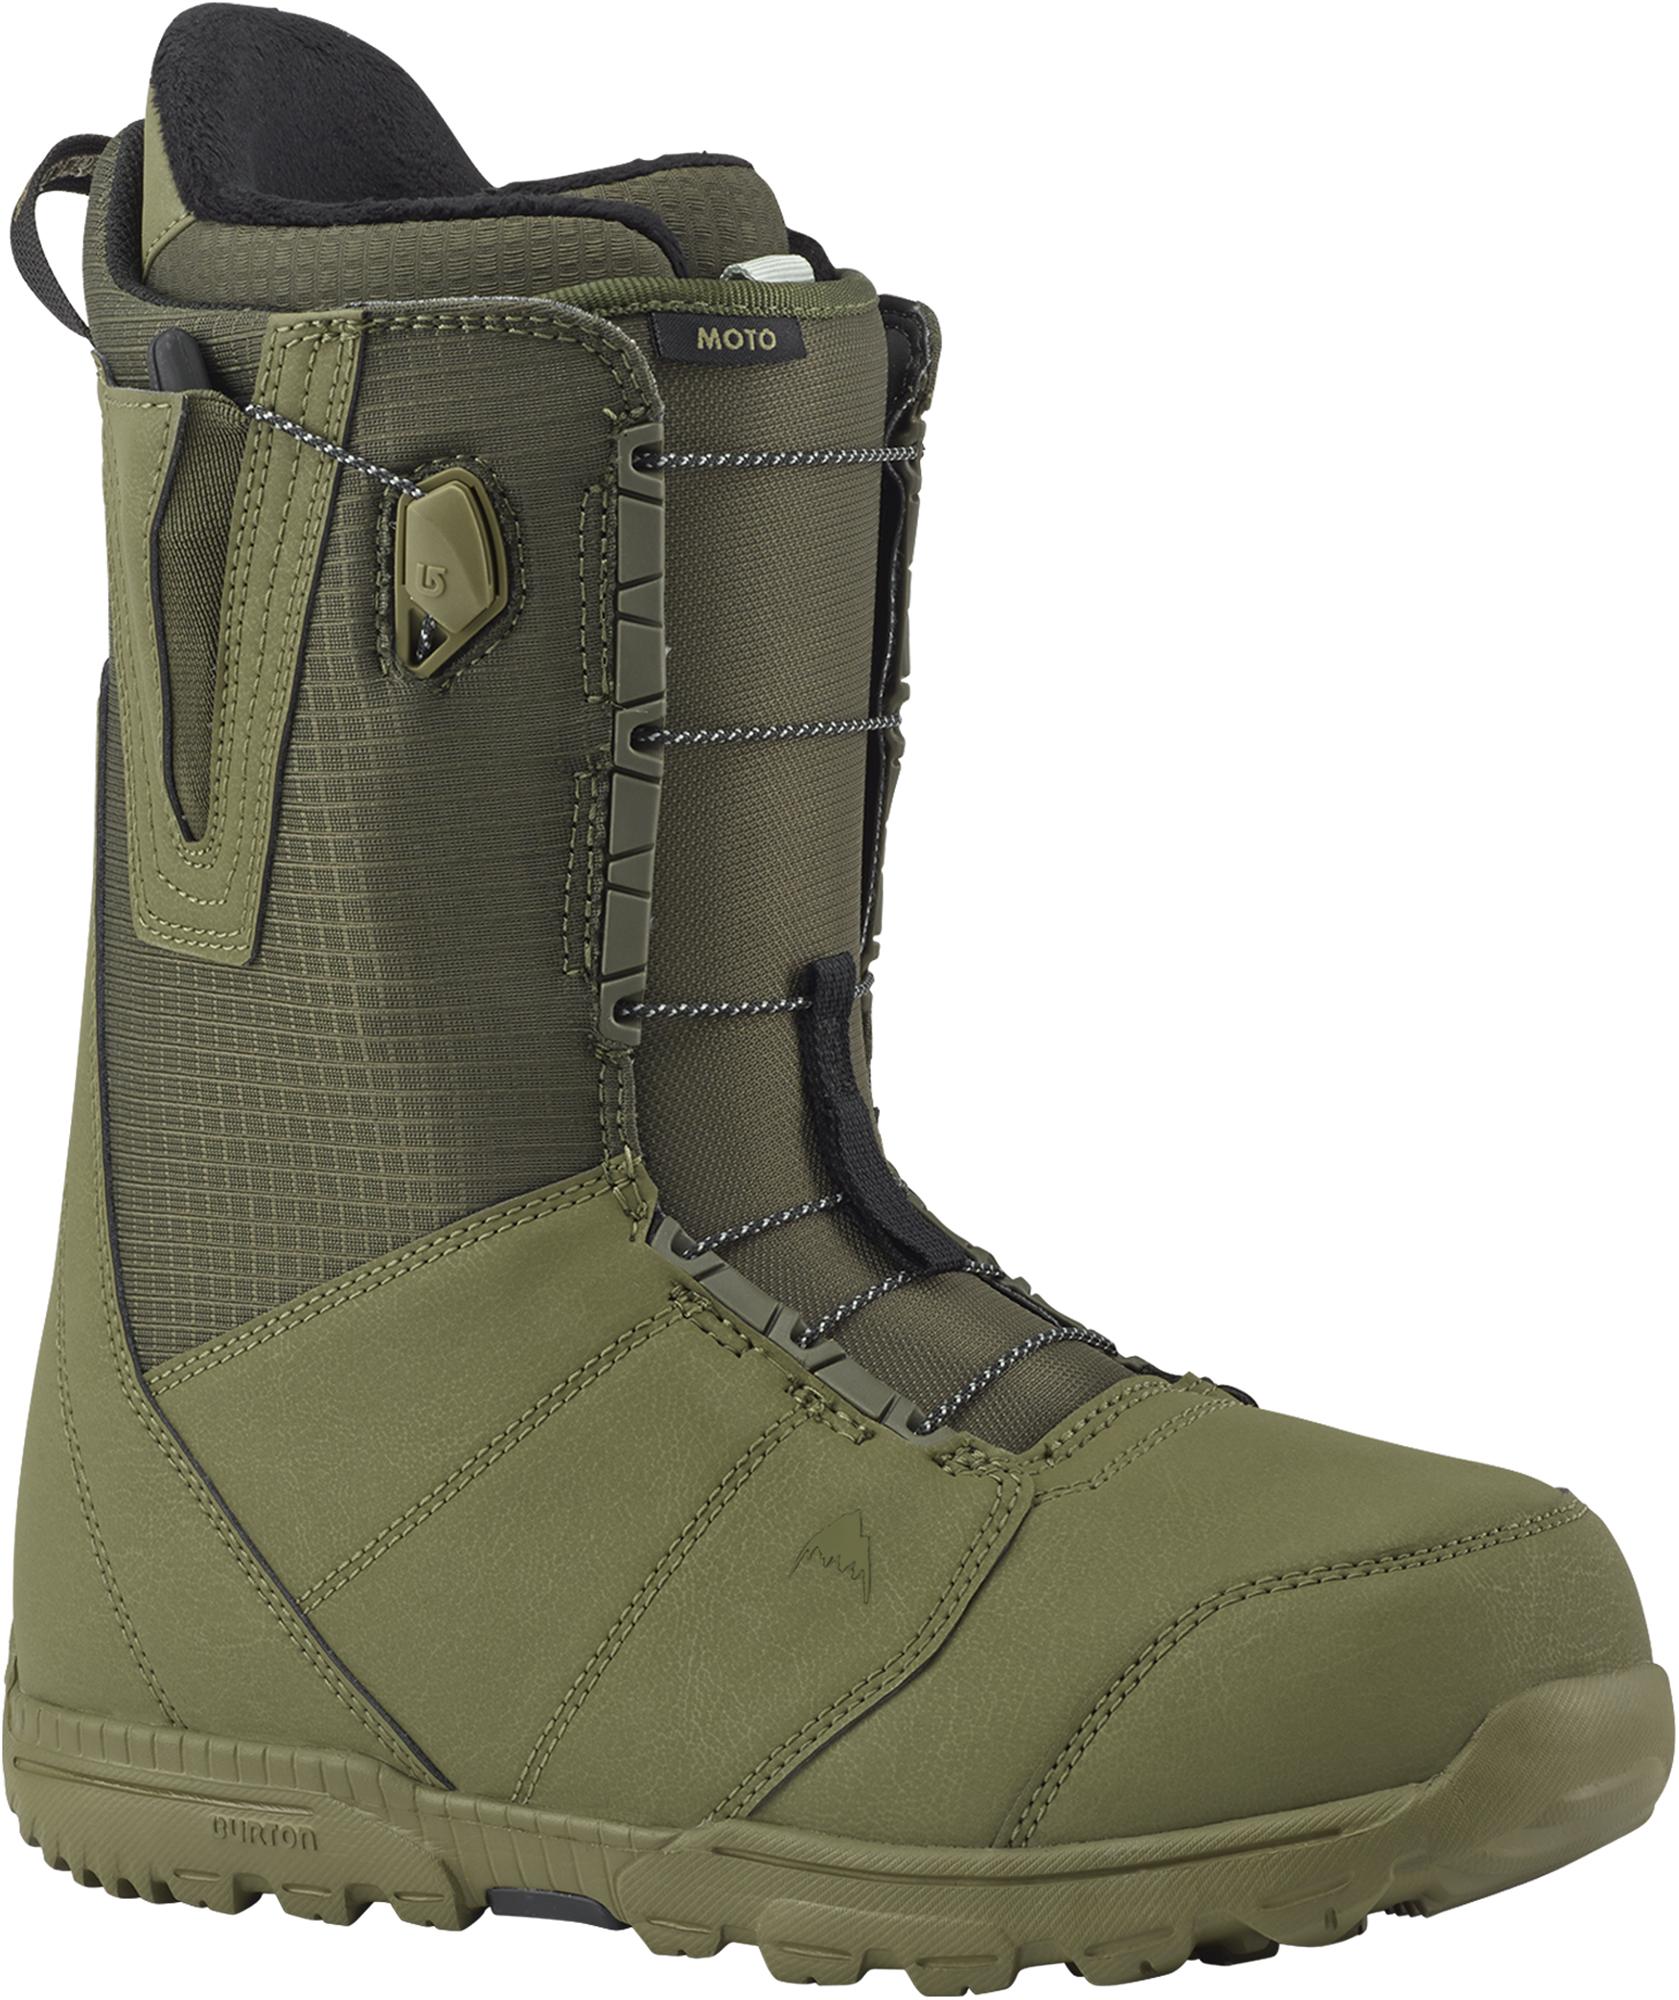 Burton Сноубордические ботинки Burton Moto, размер 43 цена